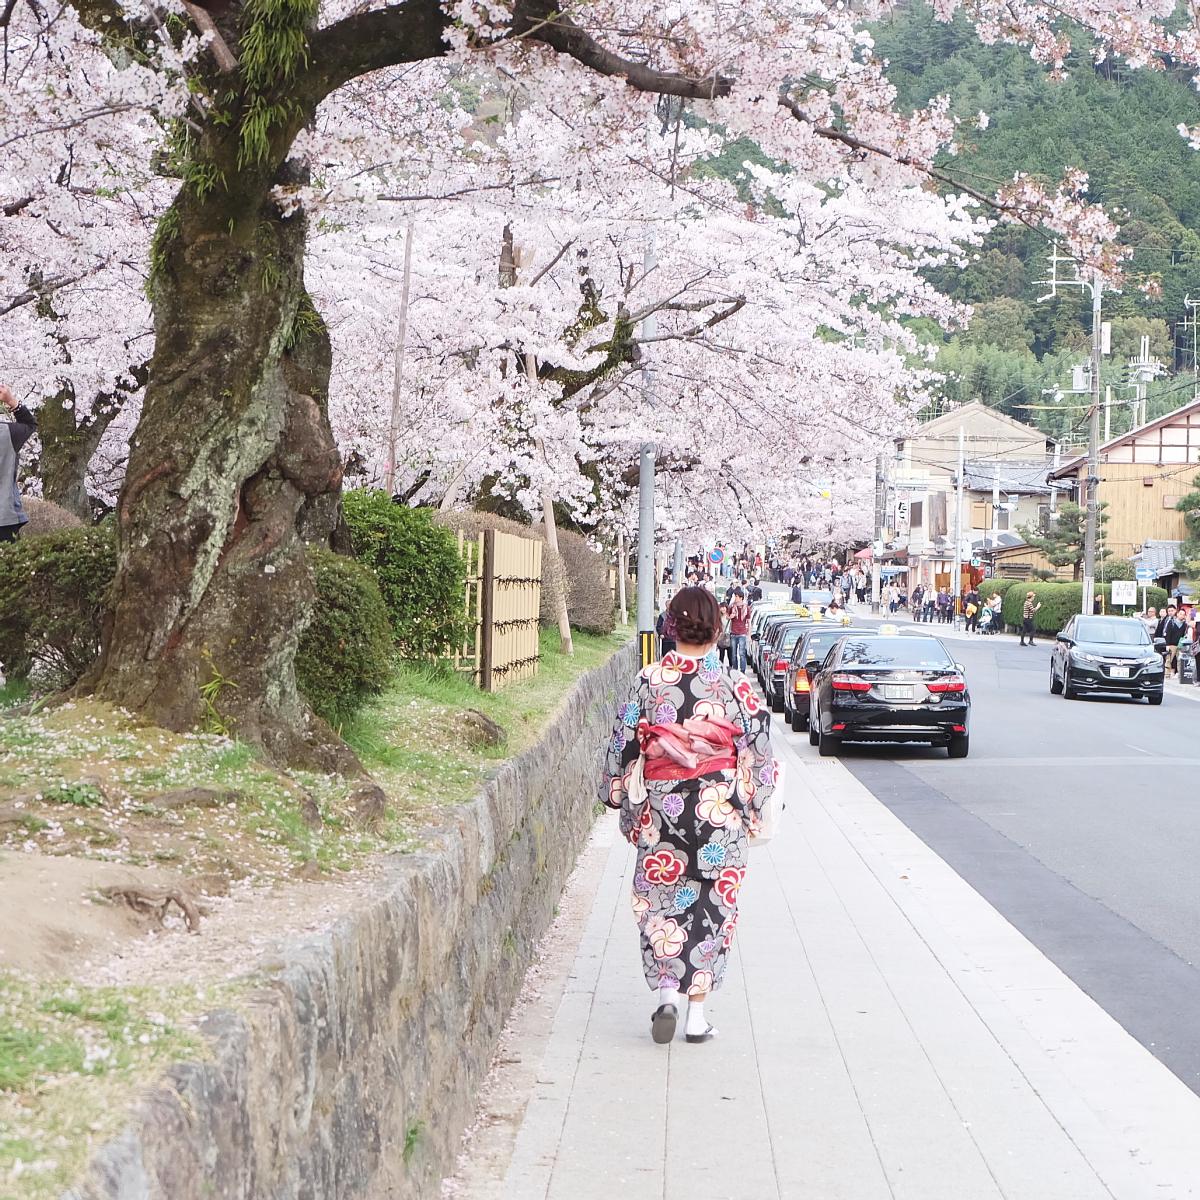 DSCF1084 kyoto sakura cherry blossoms spring 2016